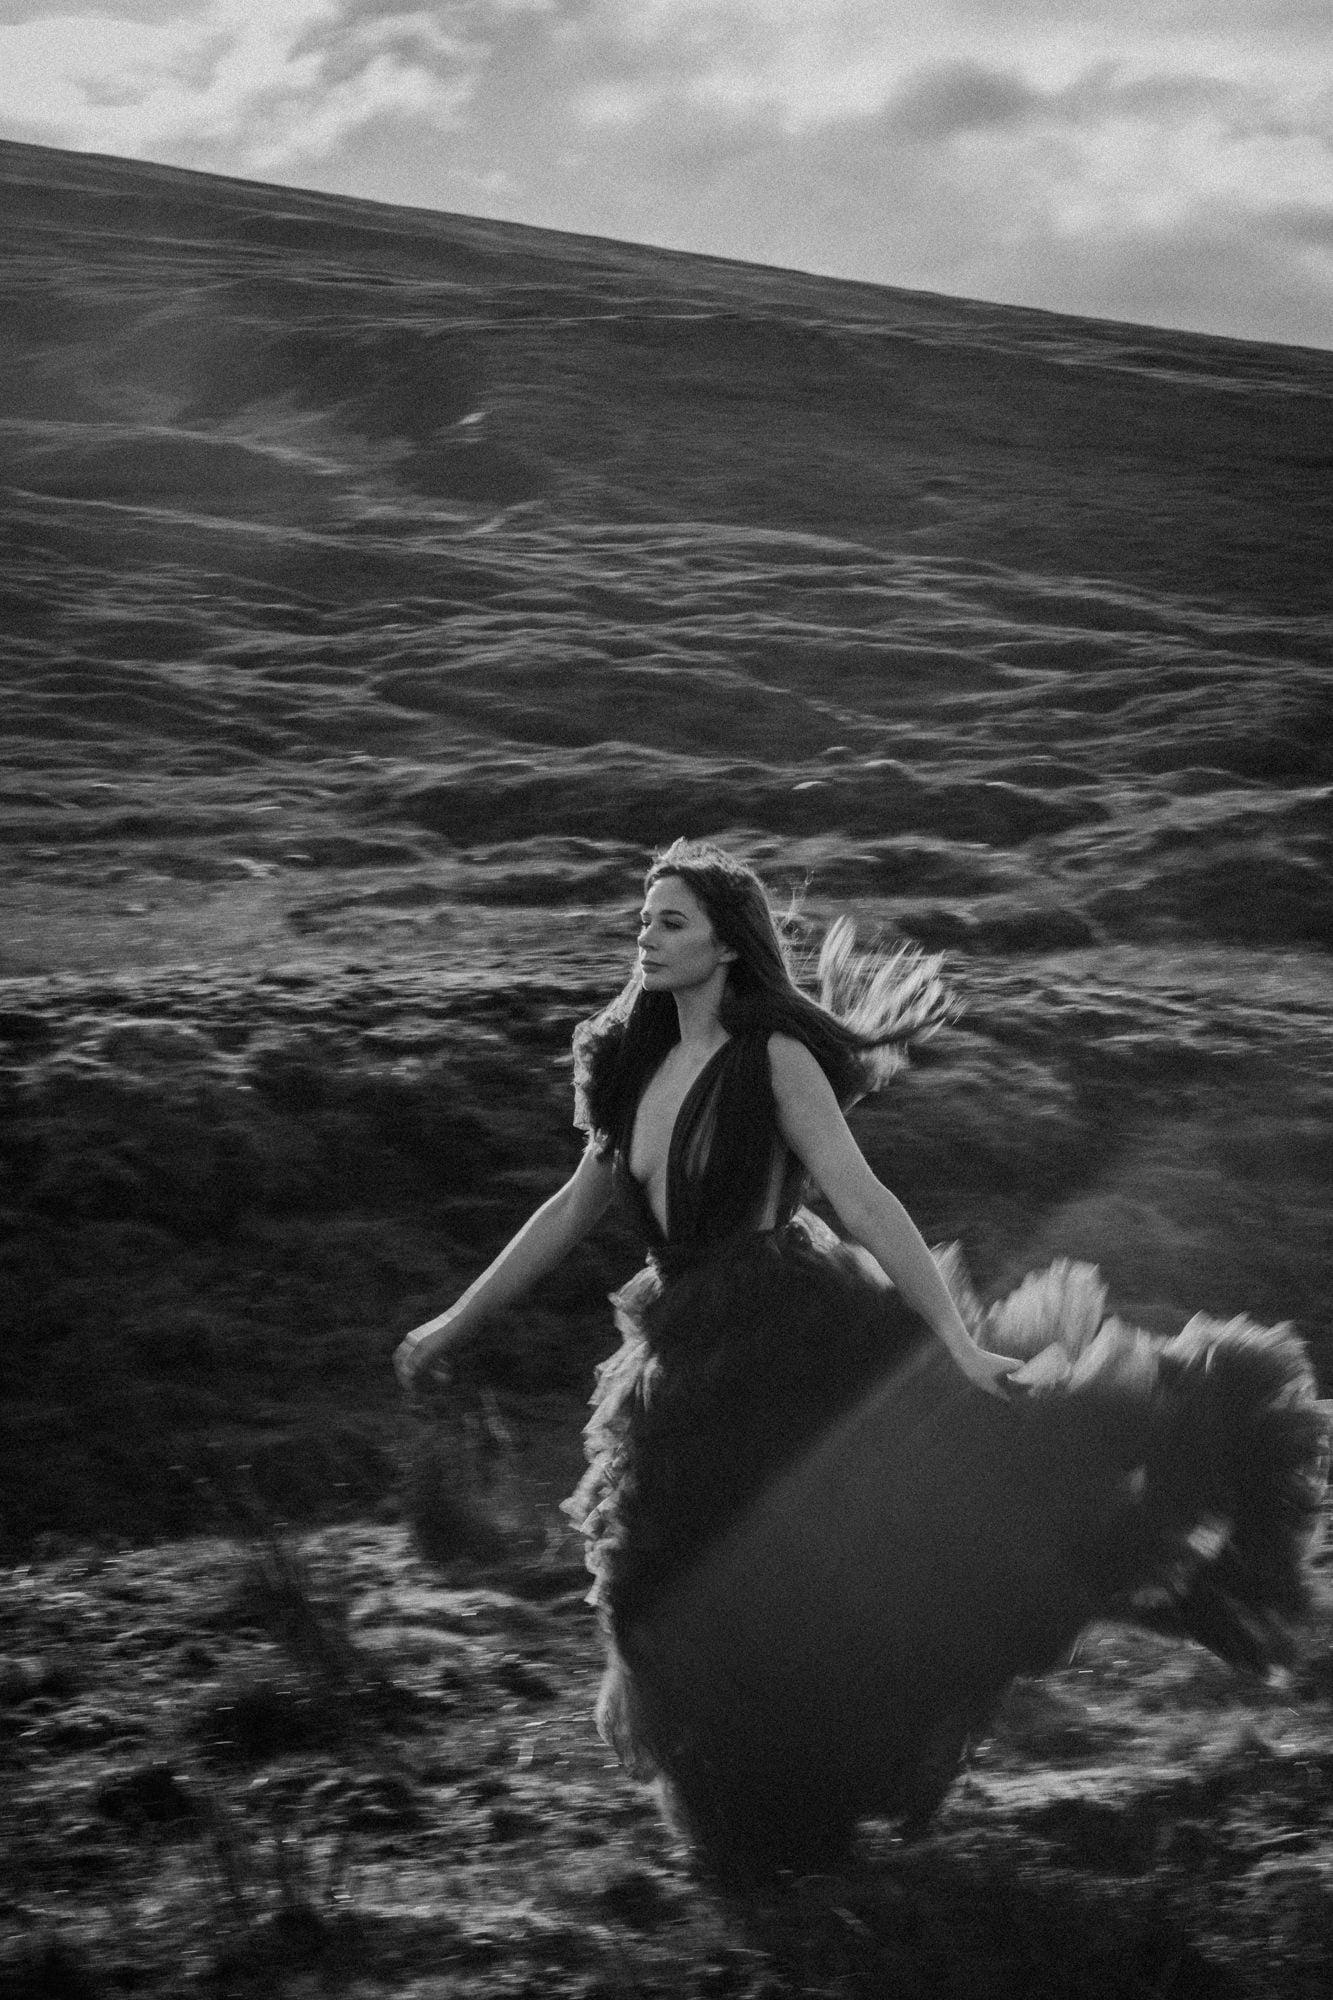 Cleo in Millia London tulle wedding dress, The Quiraing Isle of Skye Photographer by Bernadeta Kupiec, Isle of Skye Elopement Photographer